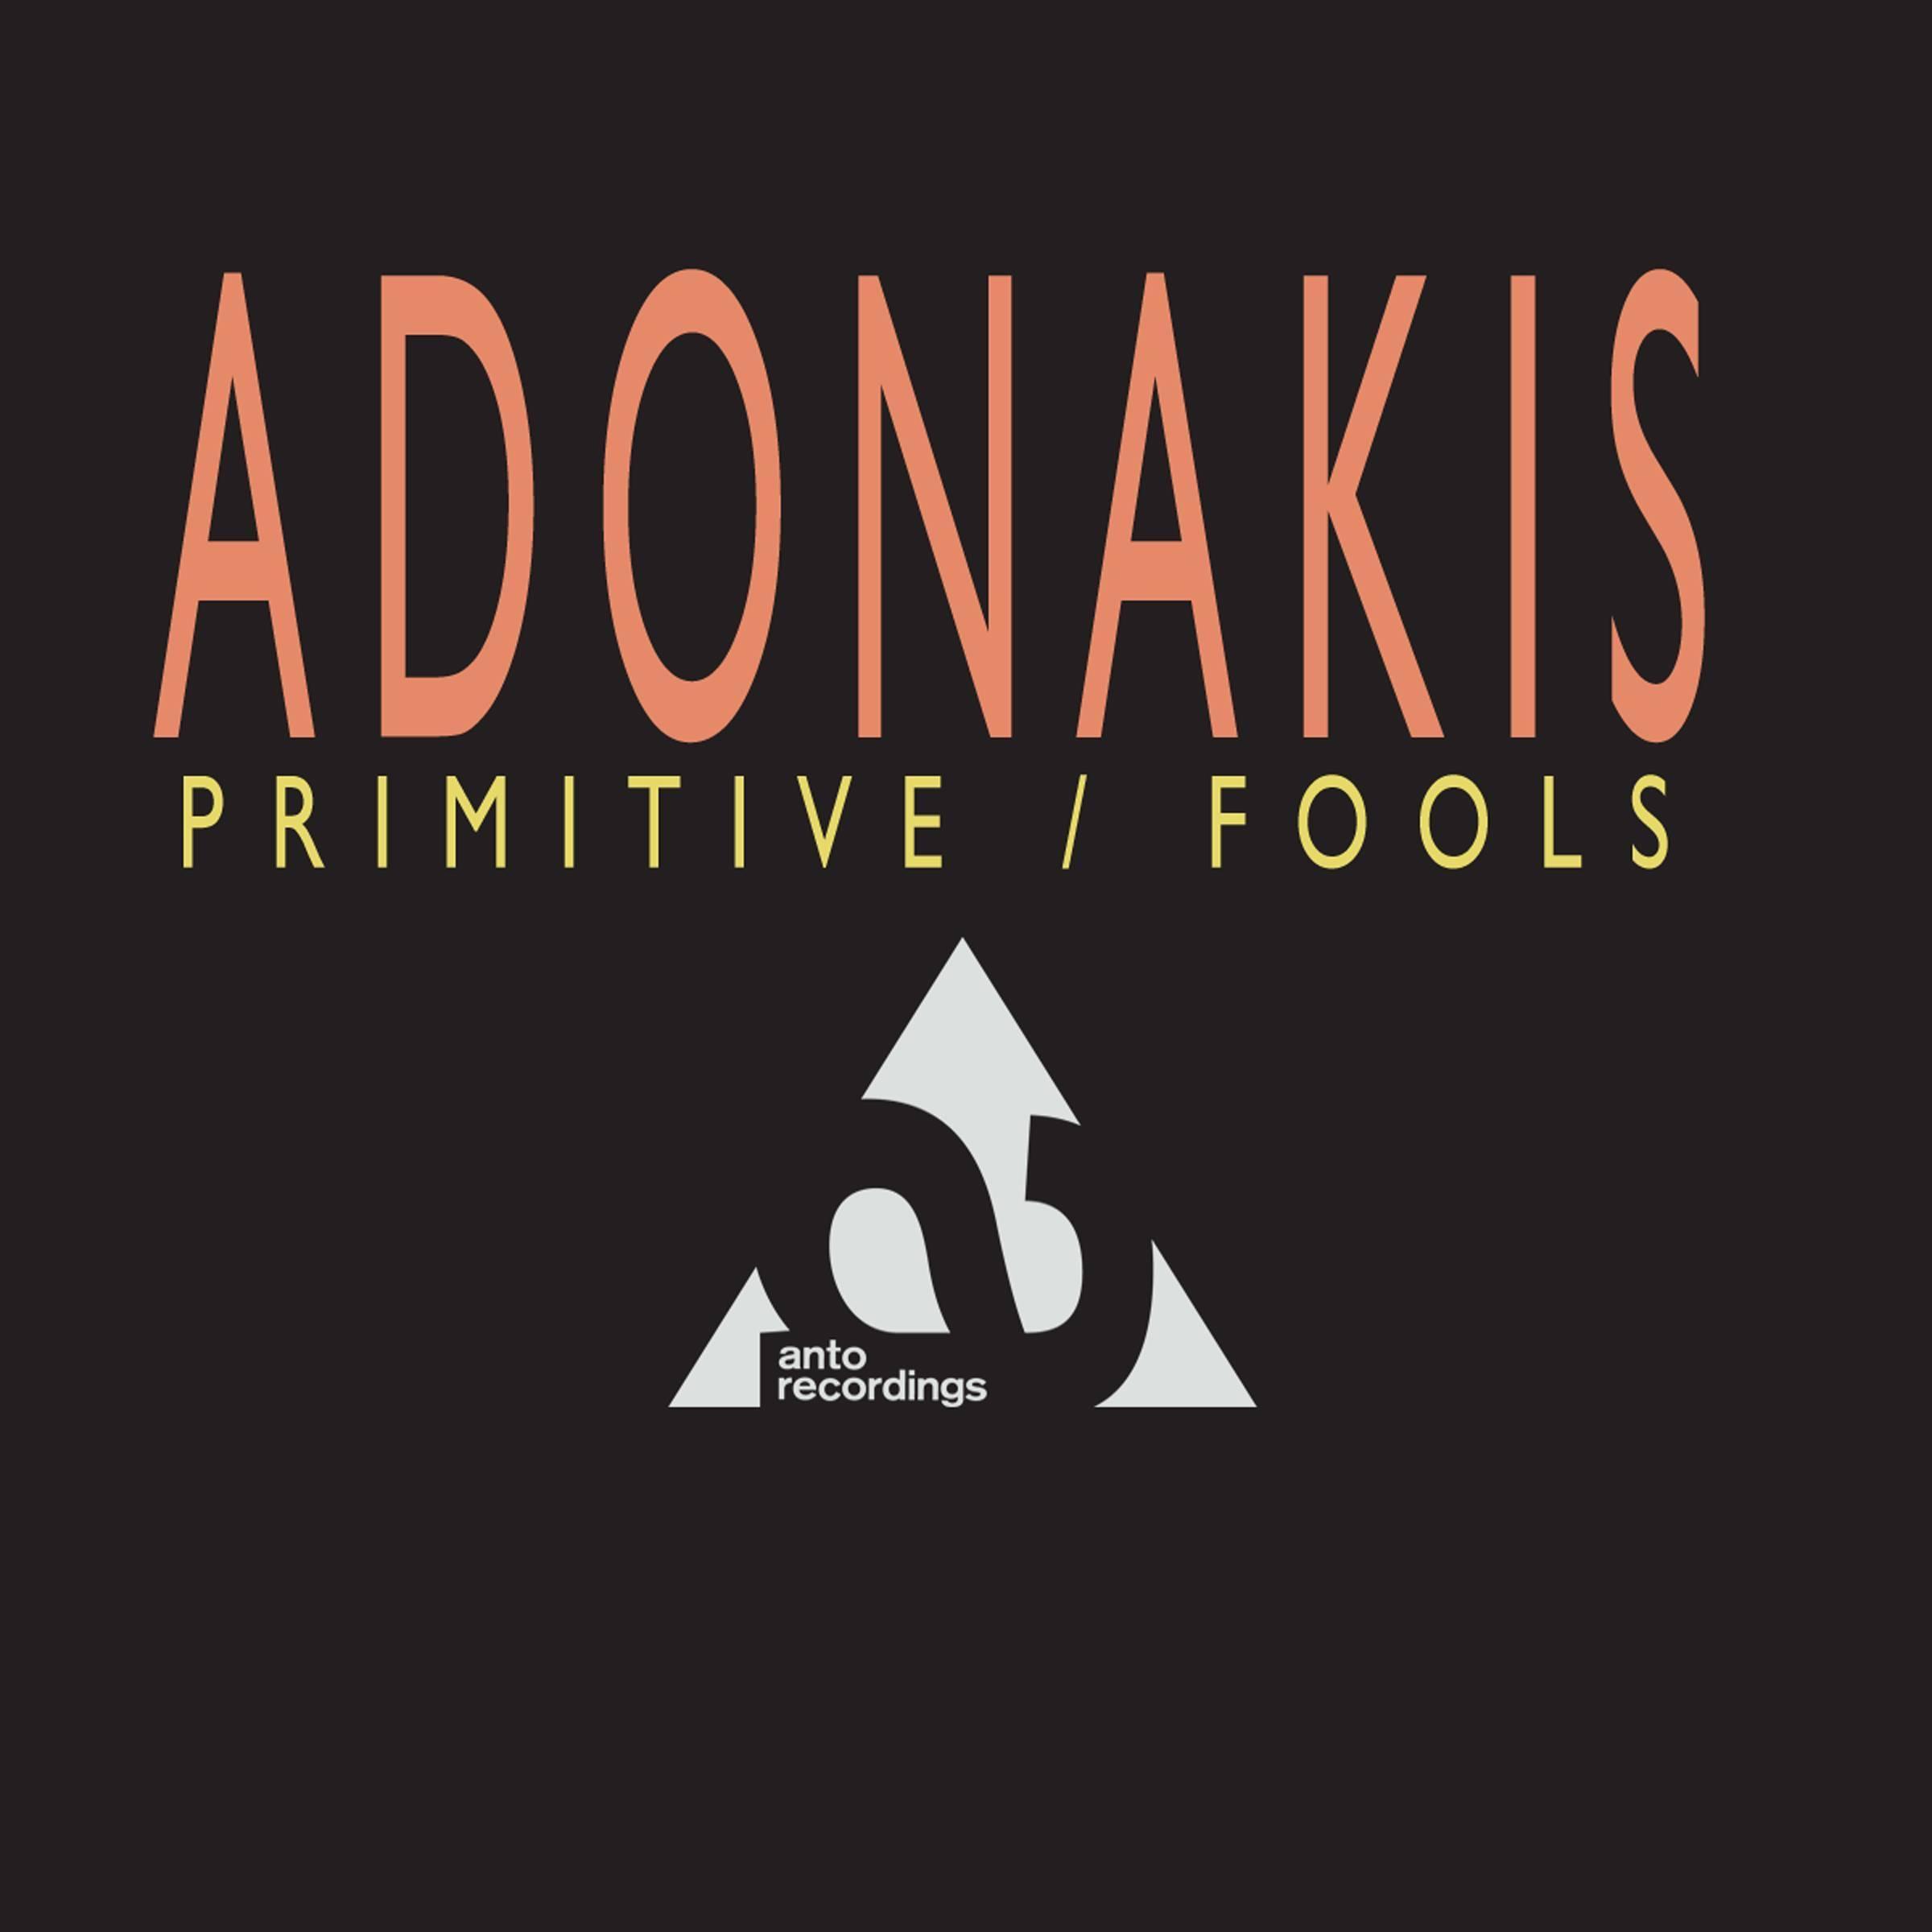 Primitive / Fools - Single